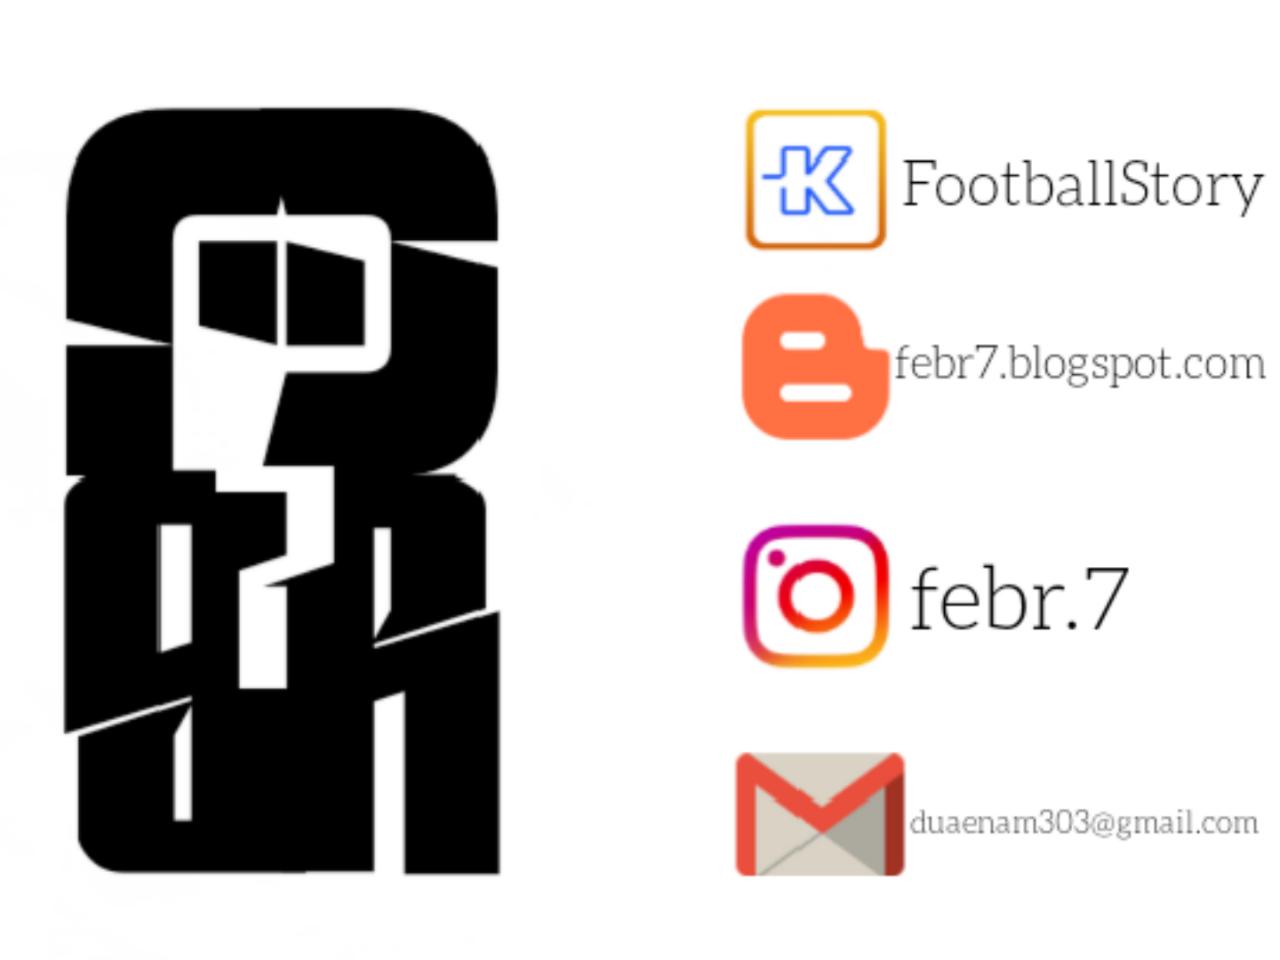 Hubungan Antara Teori Eistein, Dunia Sepakbola, Dan Filippo Inzaghi